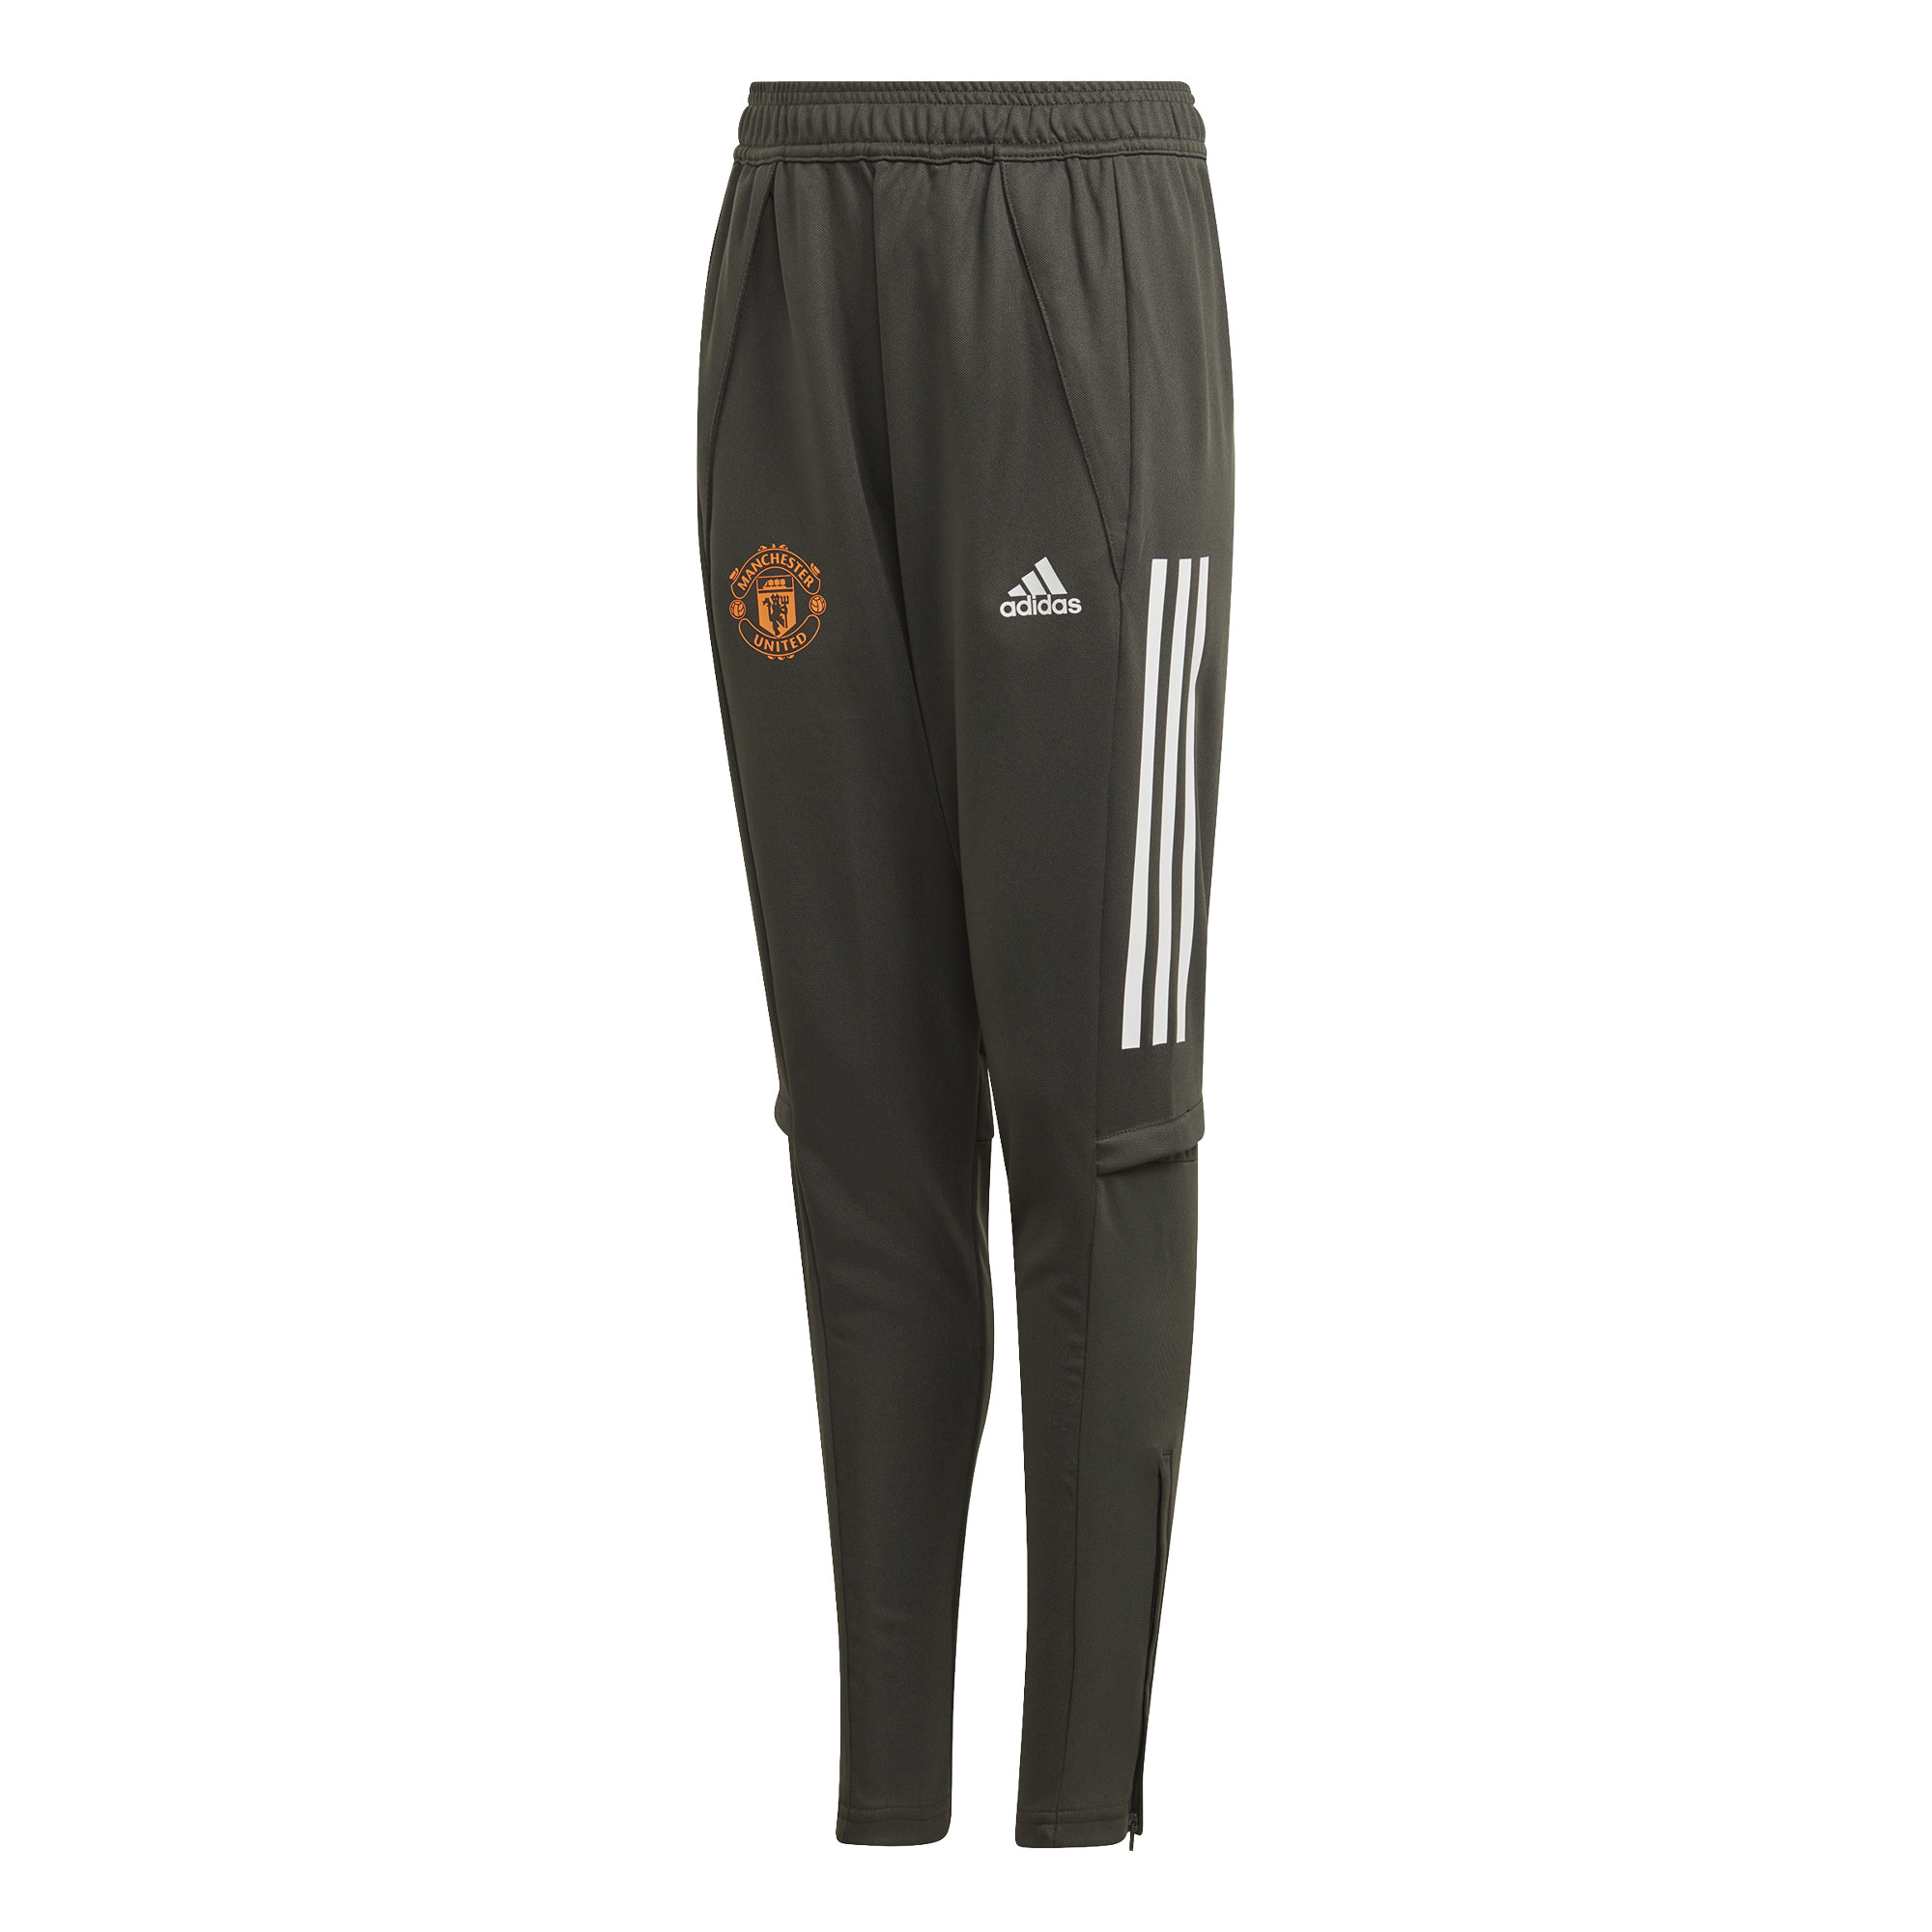 Adidas ADIDAS JR Manchester United Training Pant '20-'21